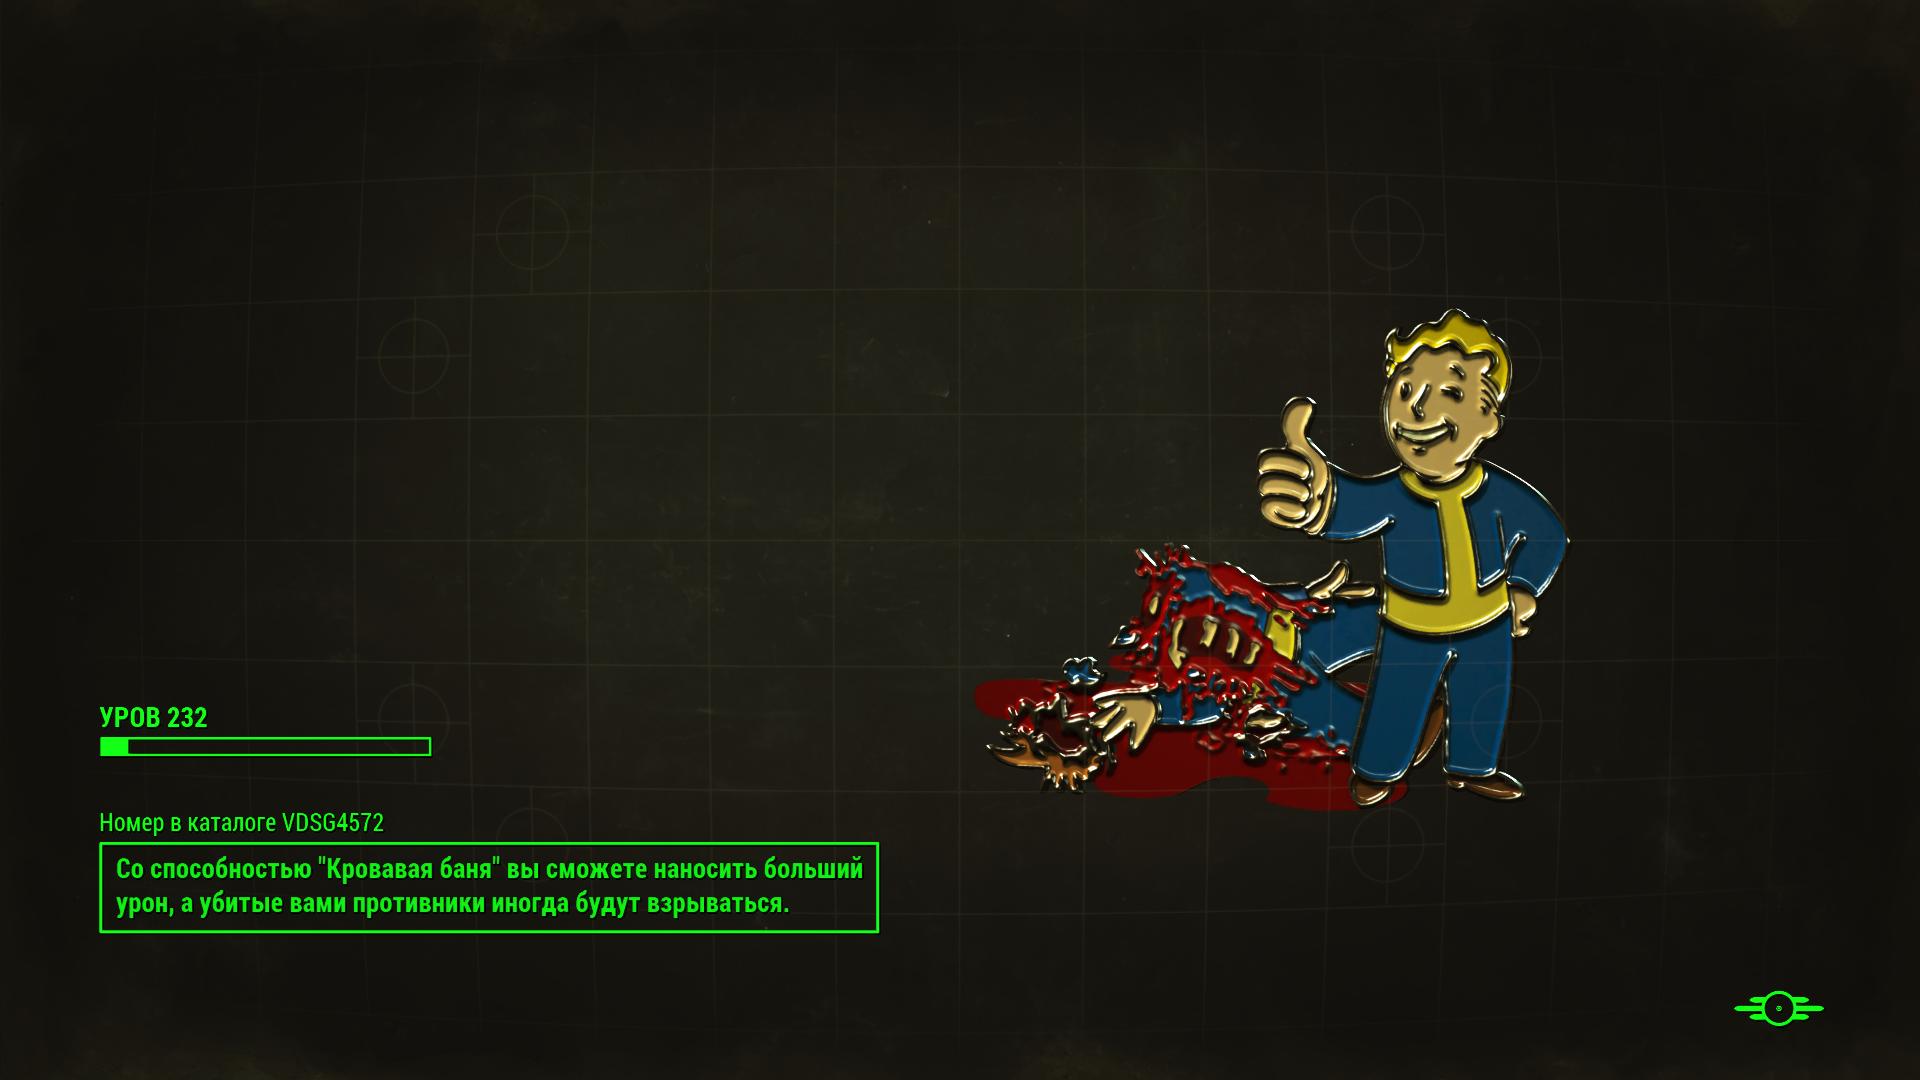 Кровавая баня (Fallout 4)